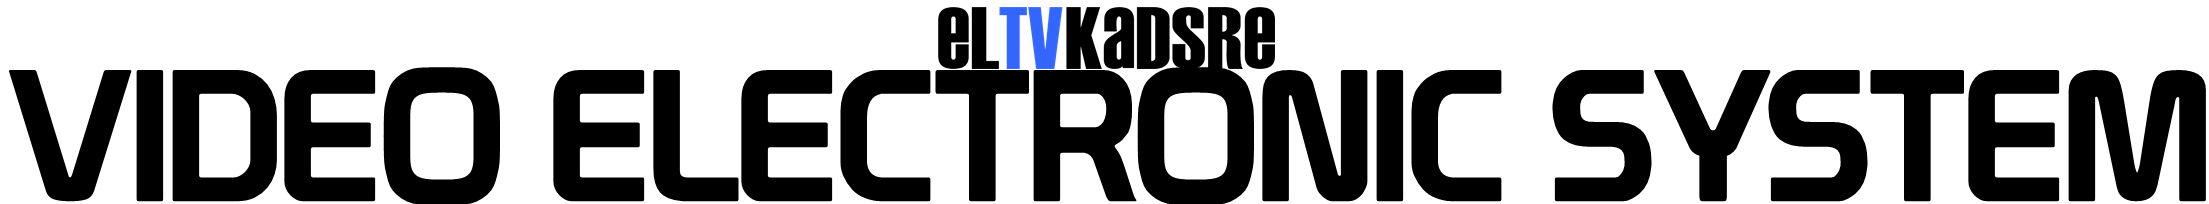 El TV Kadsre Video Electronic System